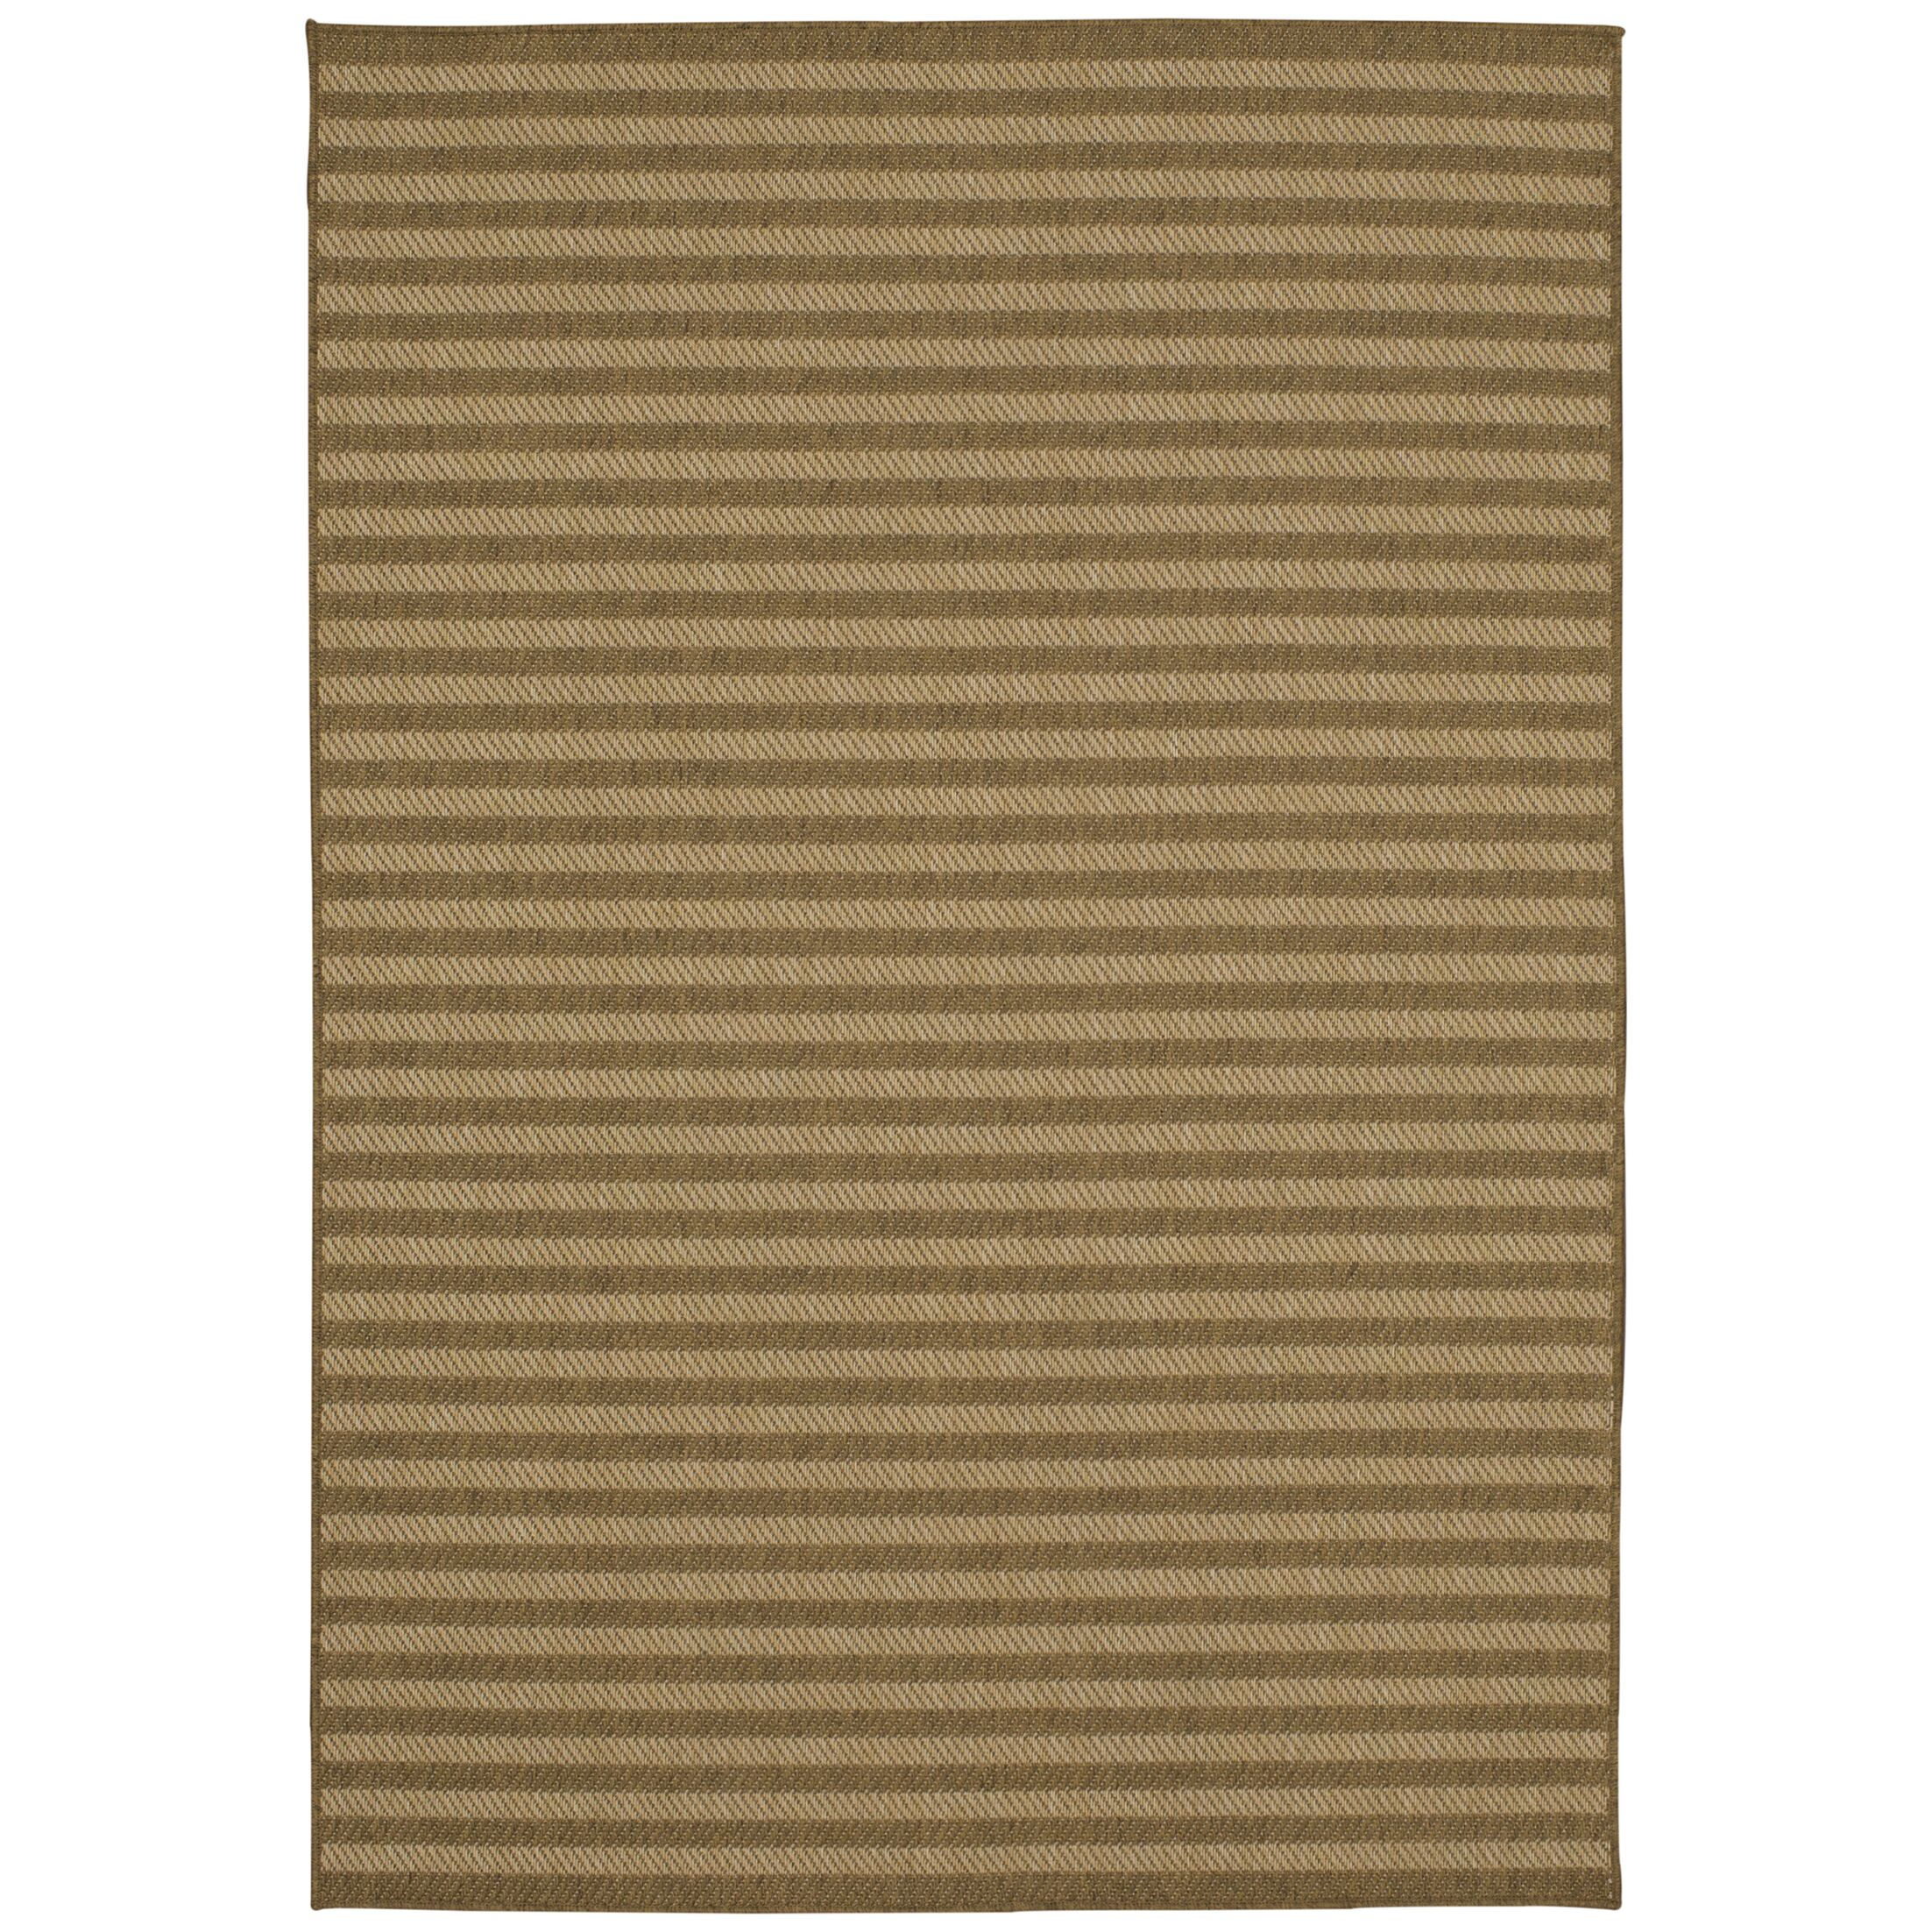 Engasser Indoor/Outdoor Tan Area Rug Rug Size: Rectangle 10'6